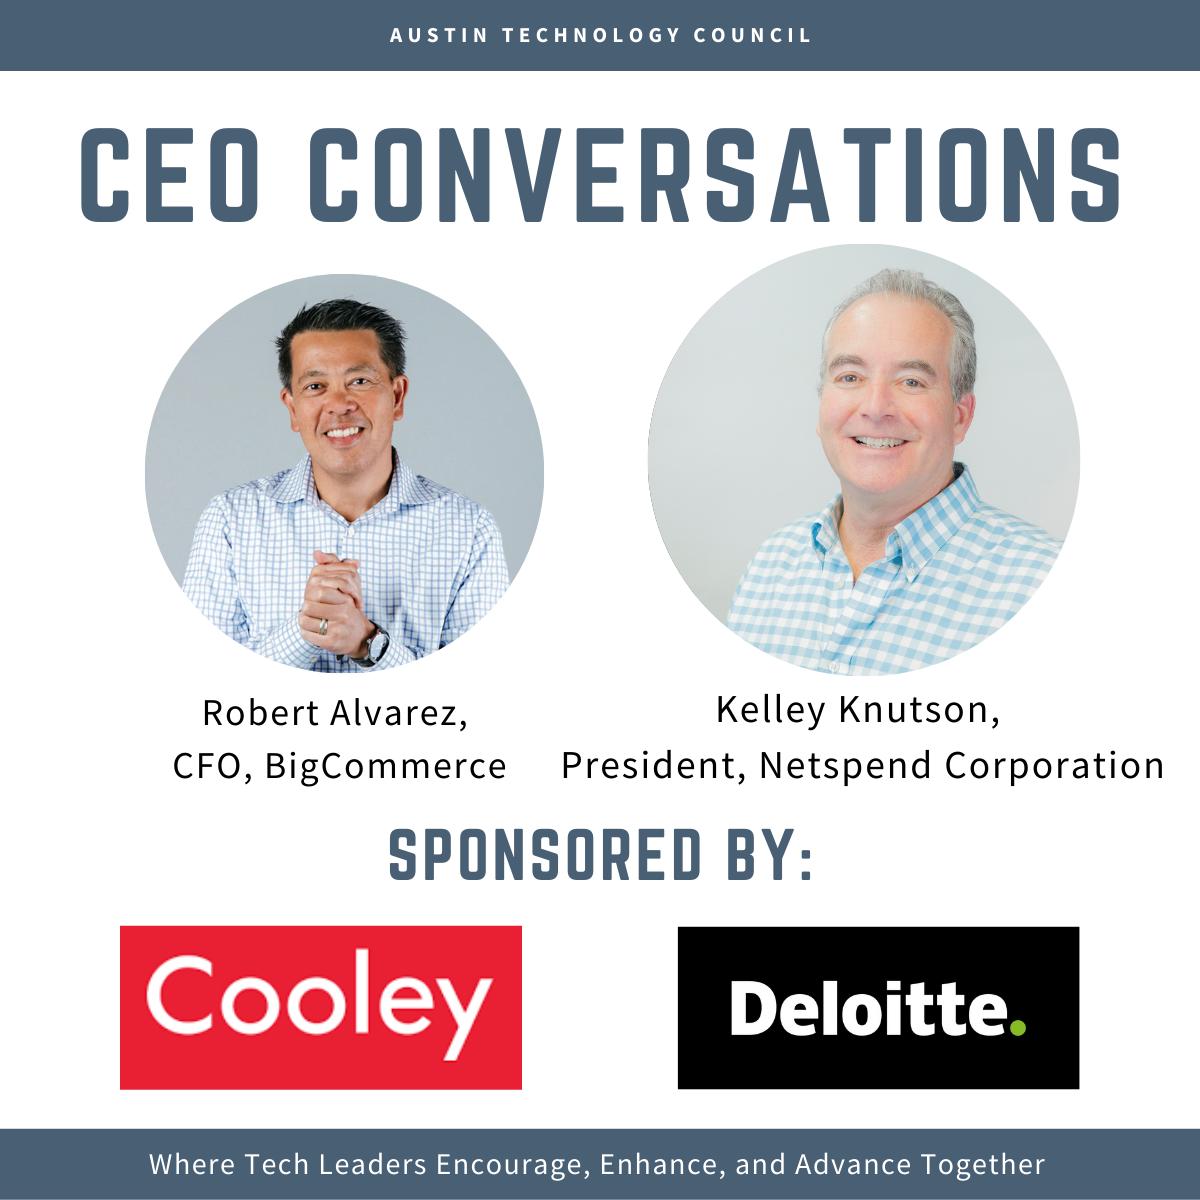 June CEO Conversations with Robert Alvarez & Kelley Knutson